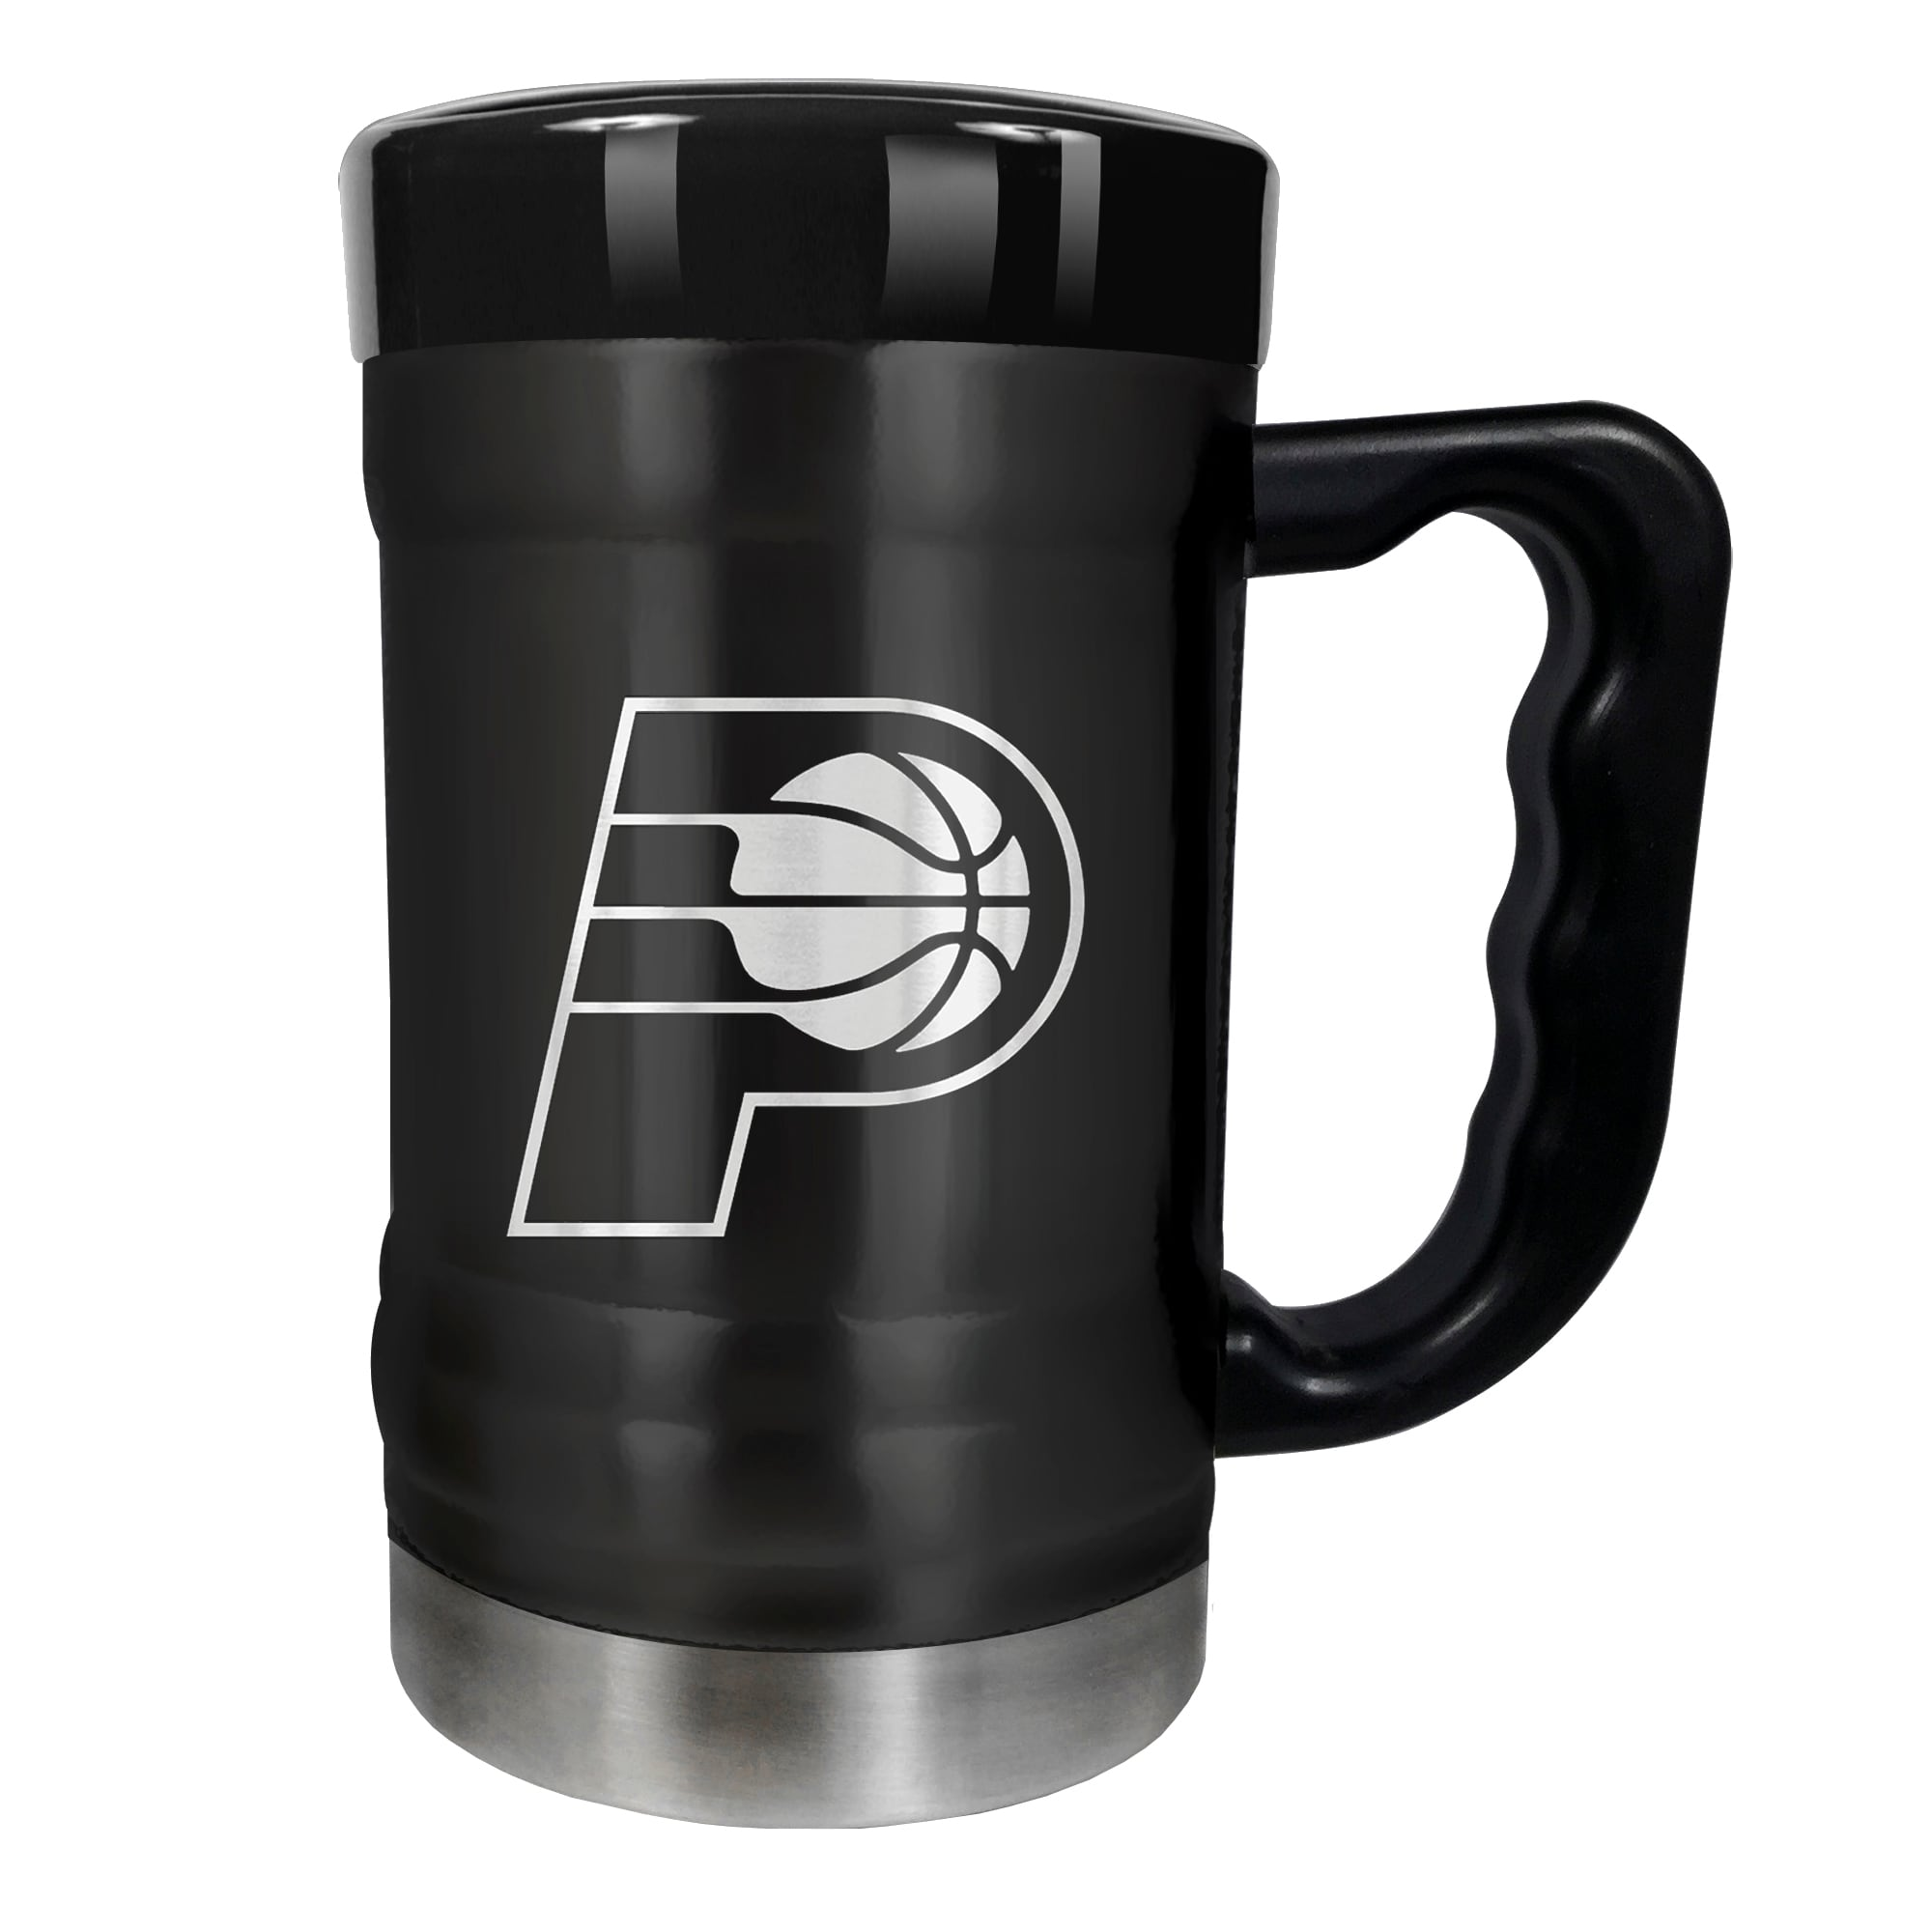 Indiana Pacers 15oz. Stealth Coach Coffee Mug - Black